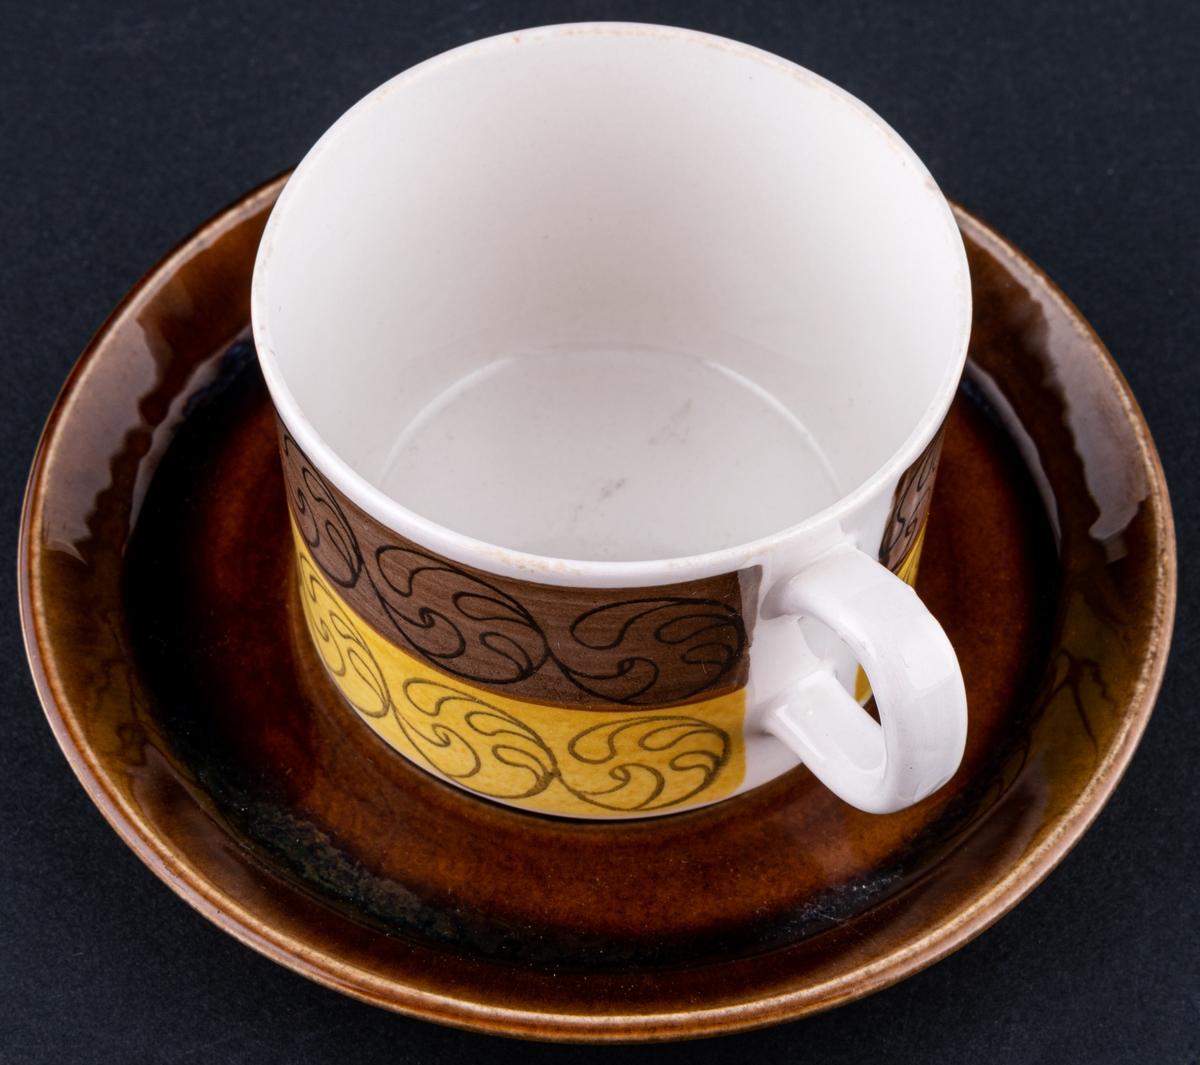 Kaffekopp med fat, modell EH i dekoren Ek. Runt koppen ett brunt och ett gult band med centrumtryck, fatet helt i brunt.